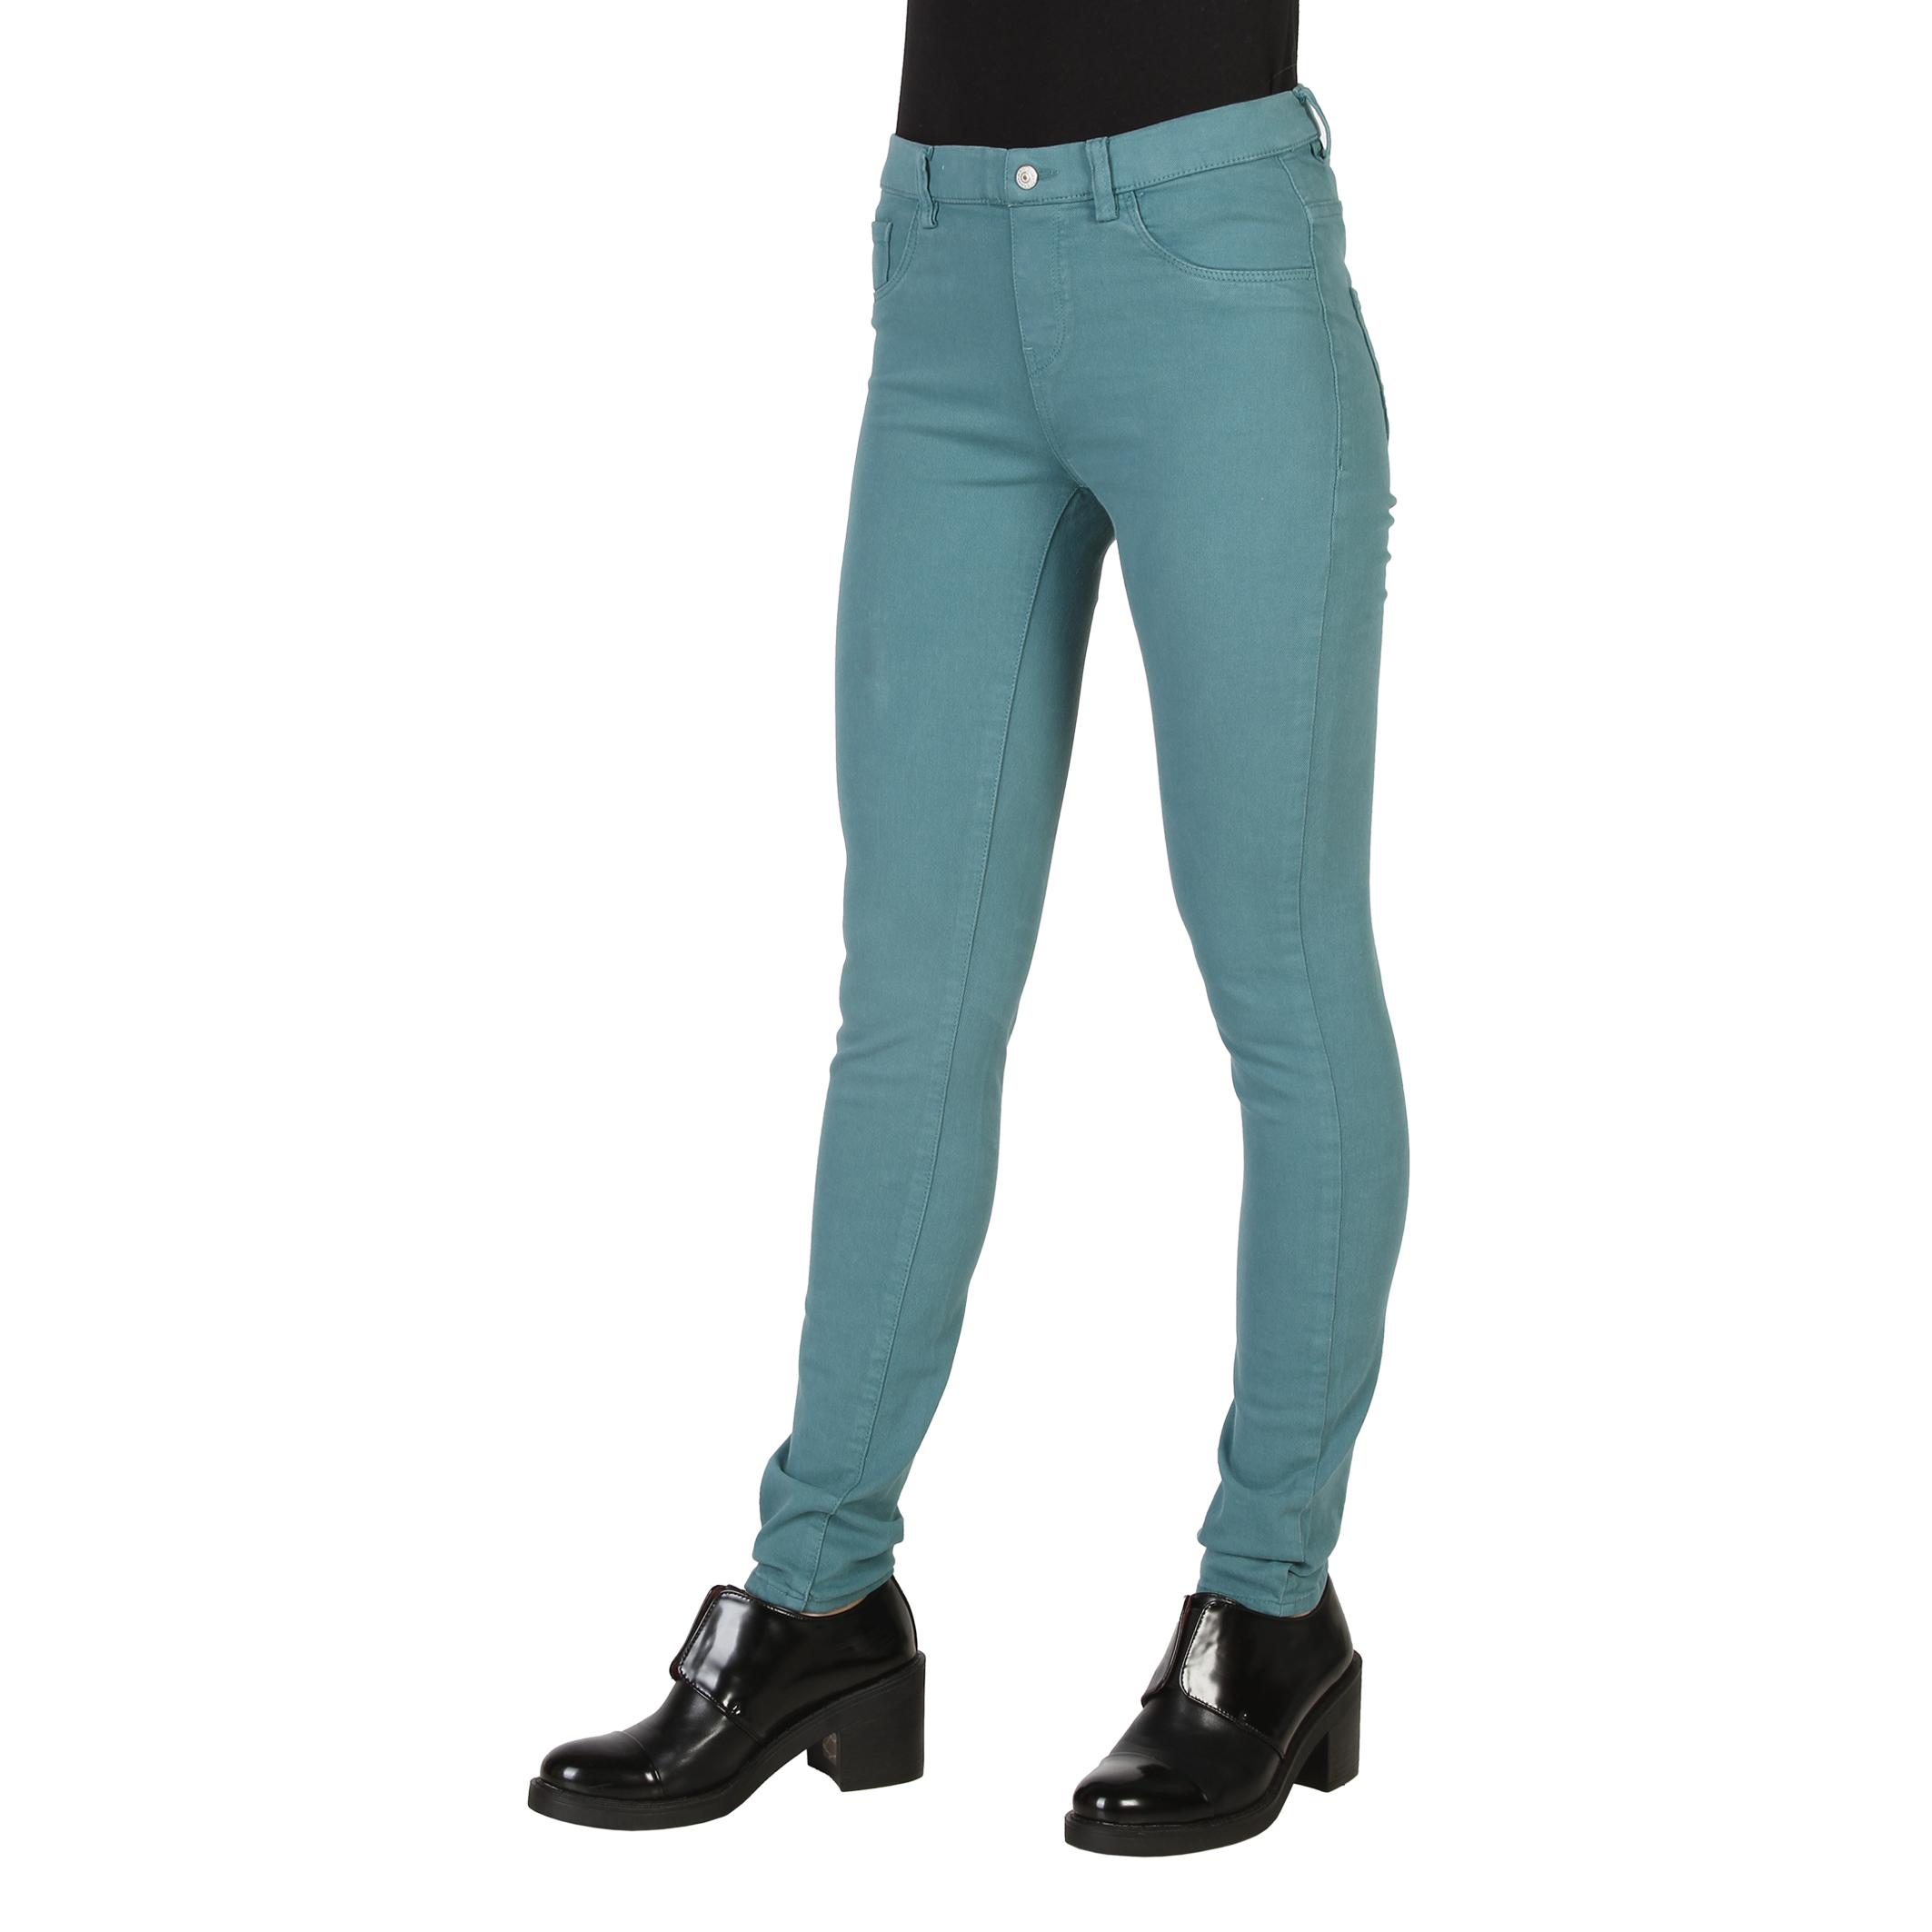 Vaqueros-Carrera-Jeans-00767L-922SS-Mujer-Gris-Verde